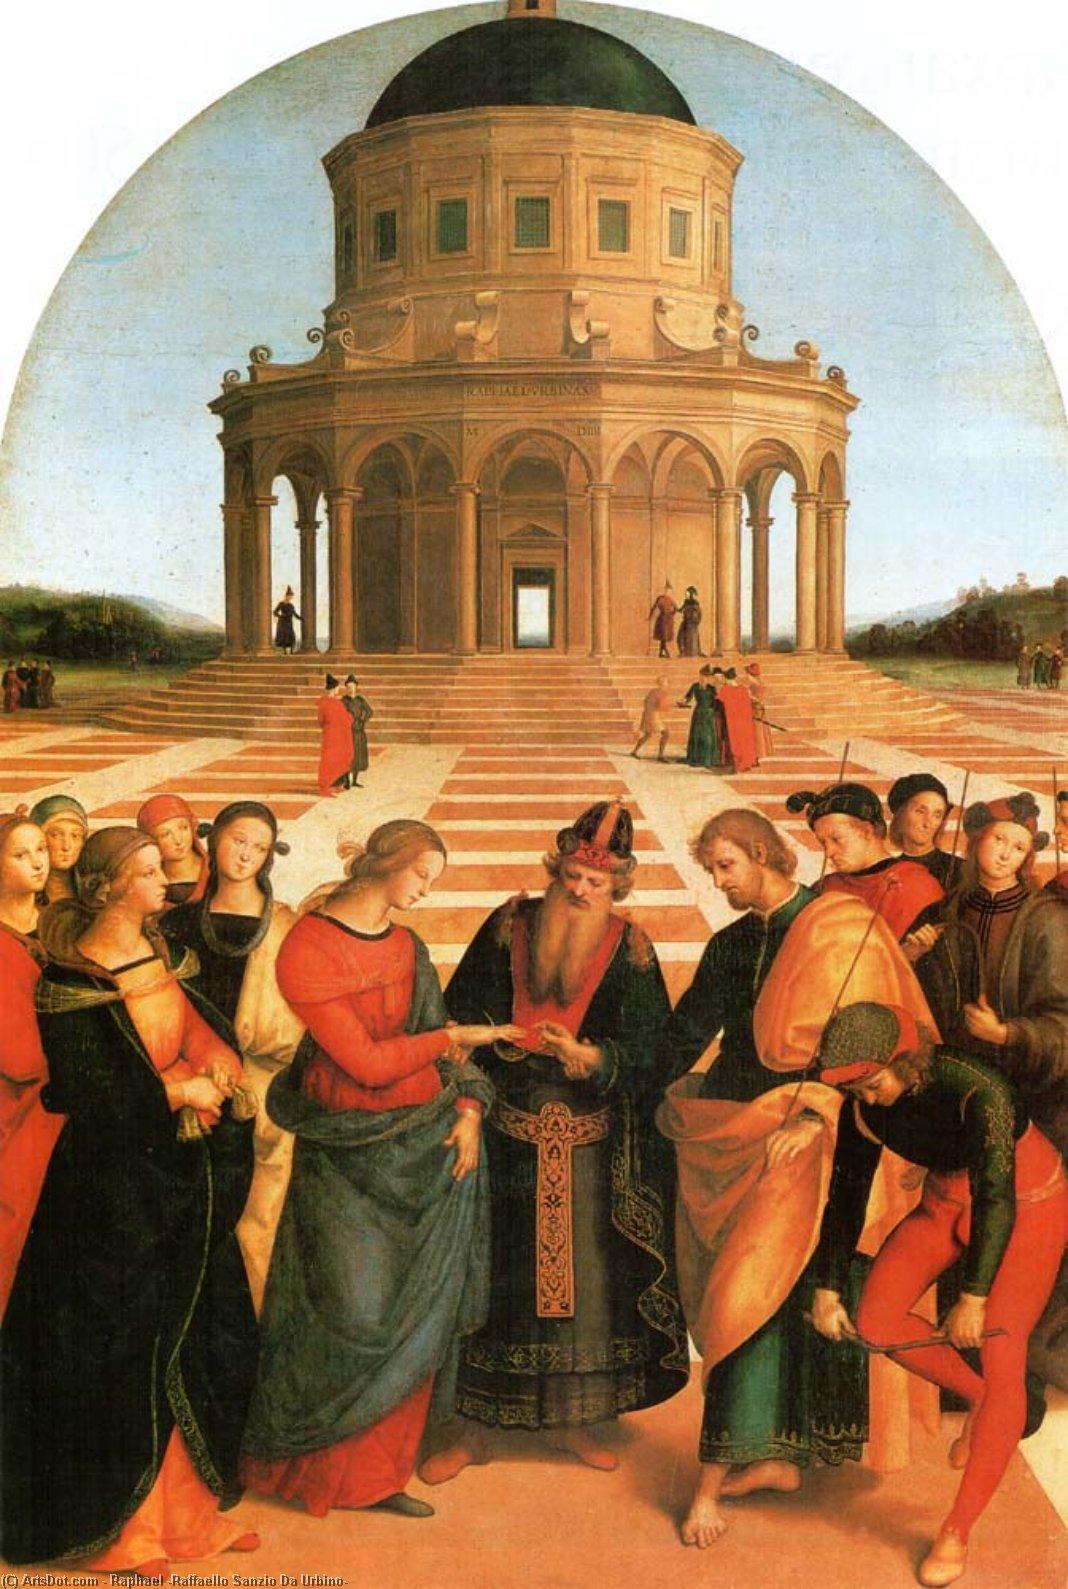 Wikioo.org - The Encyclopedia of Fine Arts - Painting, Artwork by Raphael (Raffaello Sanzio Da Urbino) - Marriage of the Virgin